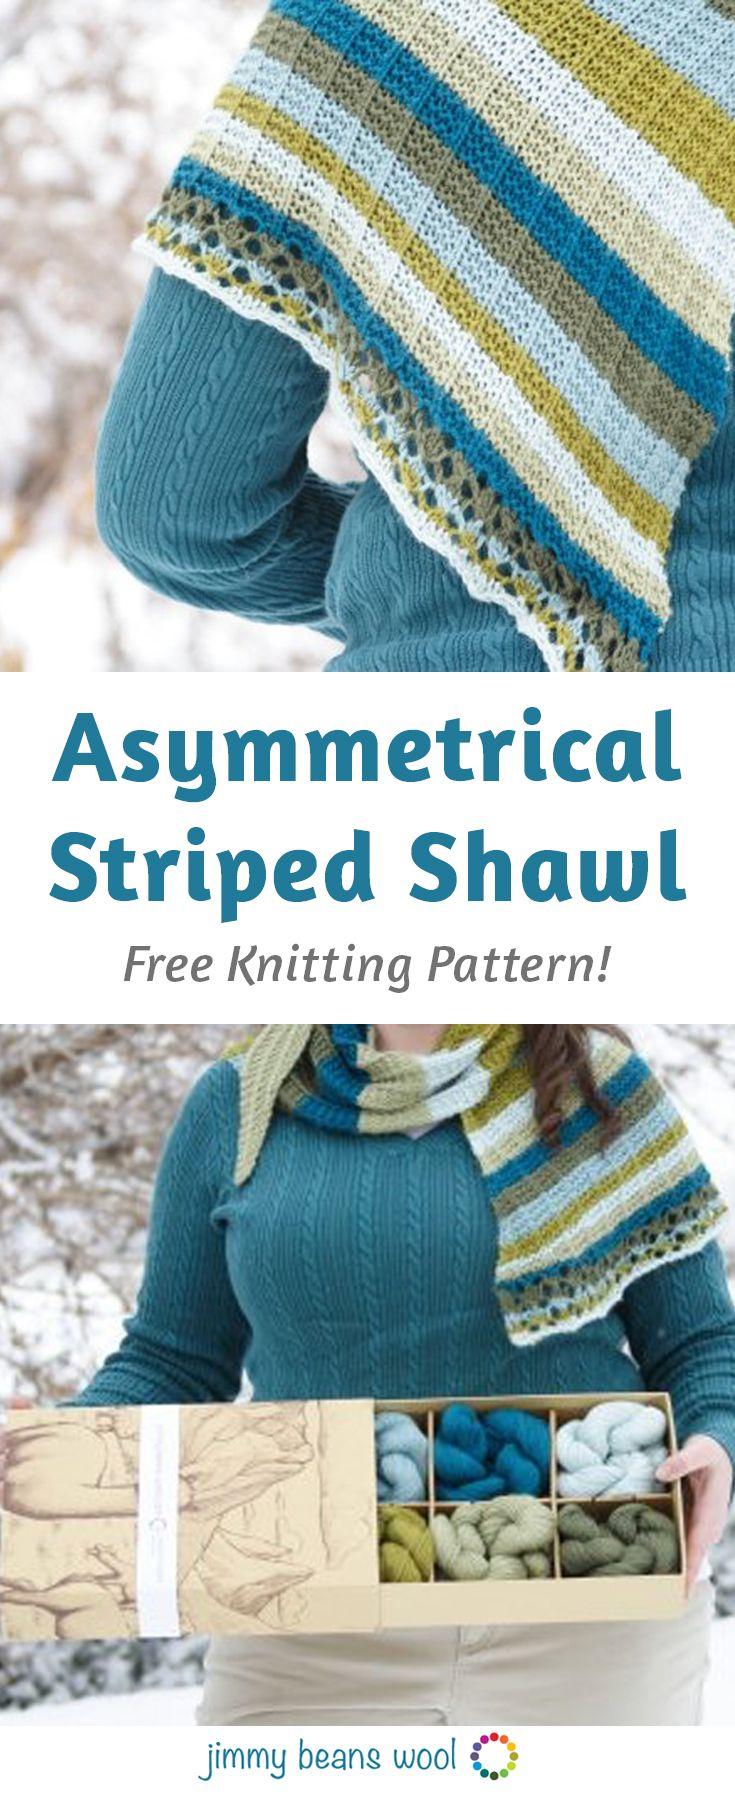 Asymmetrical Striped Shawl Free Knitting Pattern | Free Knitting ...